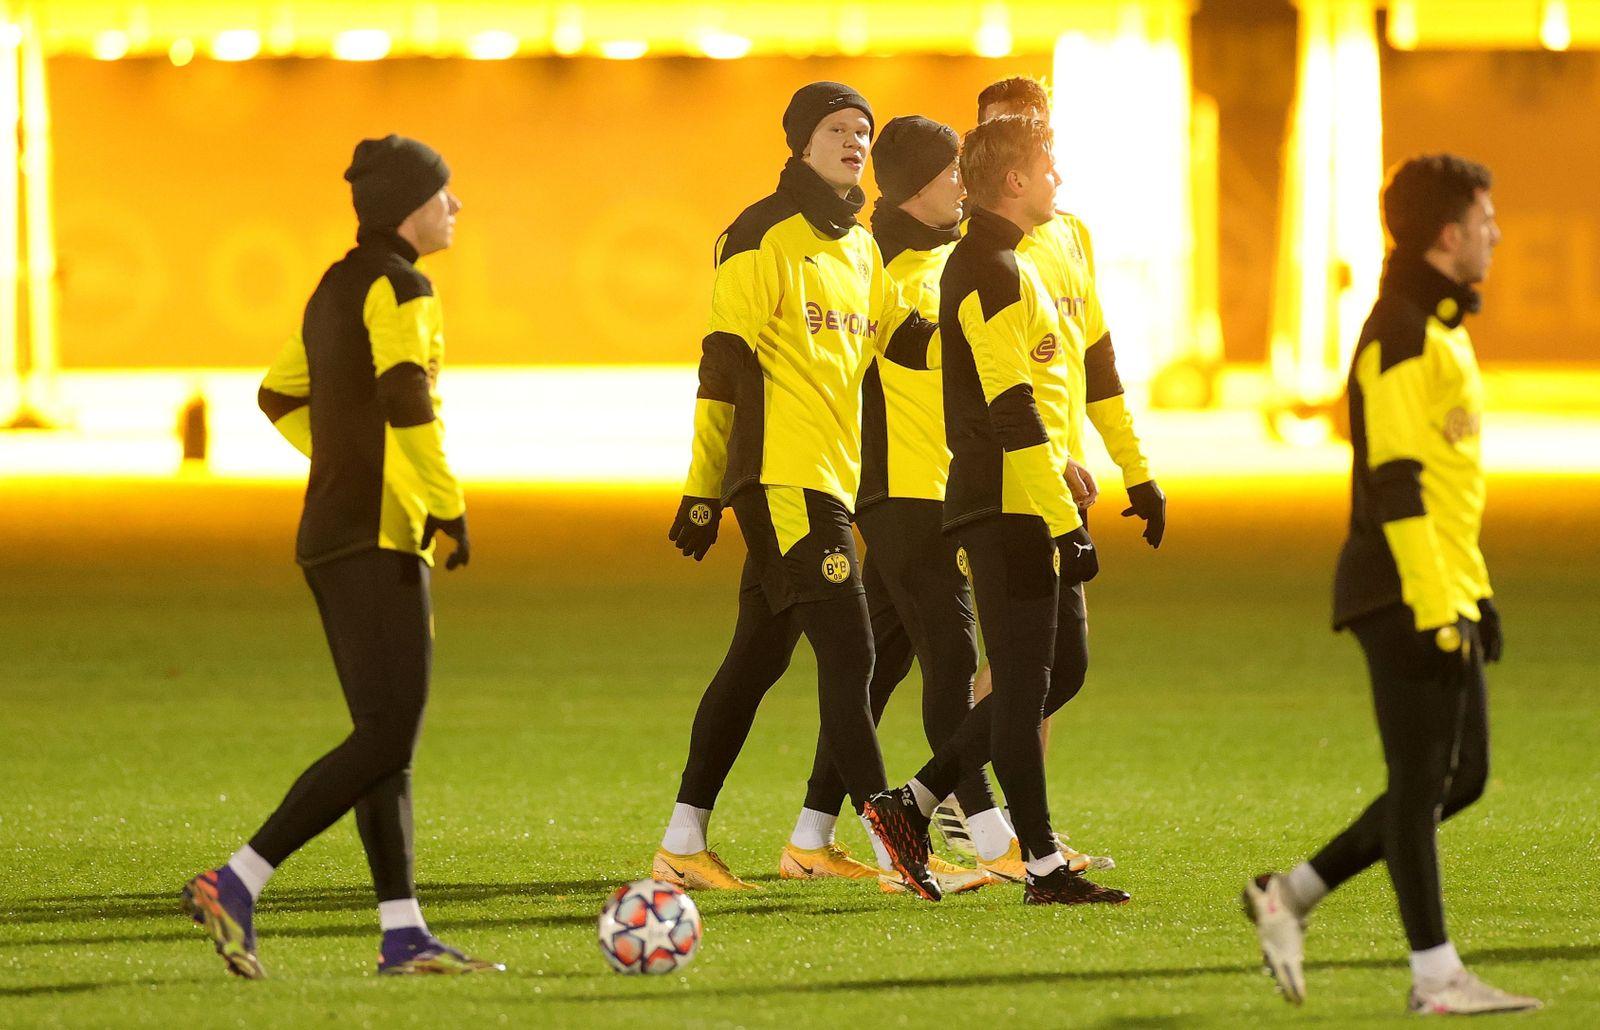 Borussia Dortmund training, Germany - 01 Dec 2020